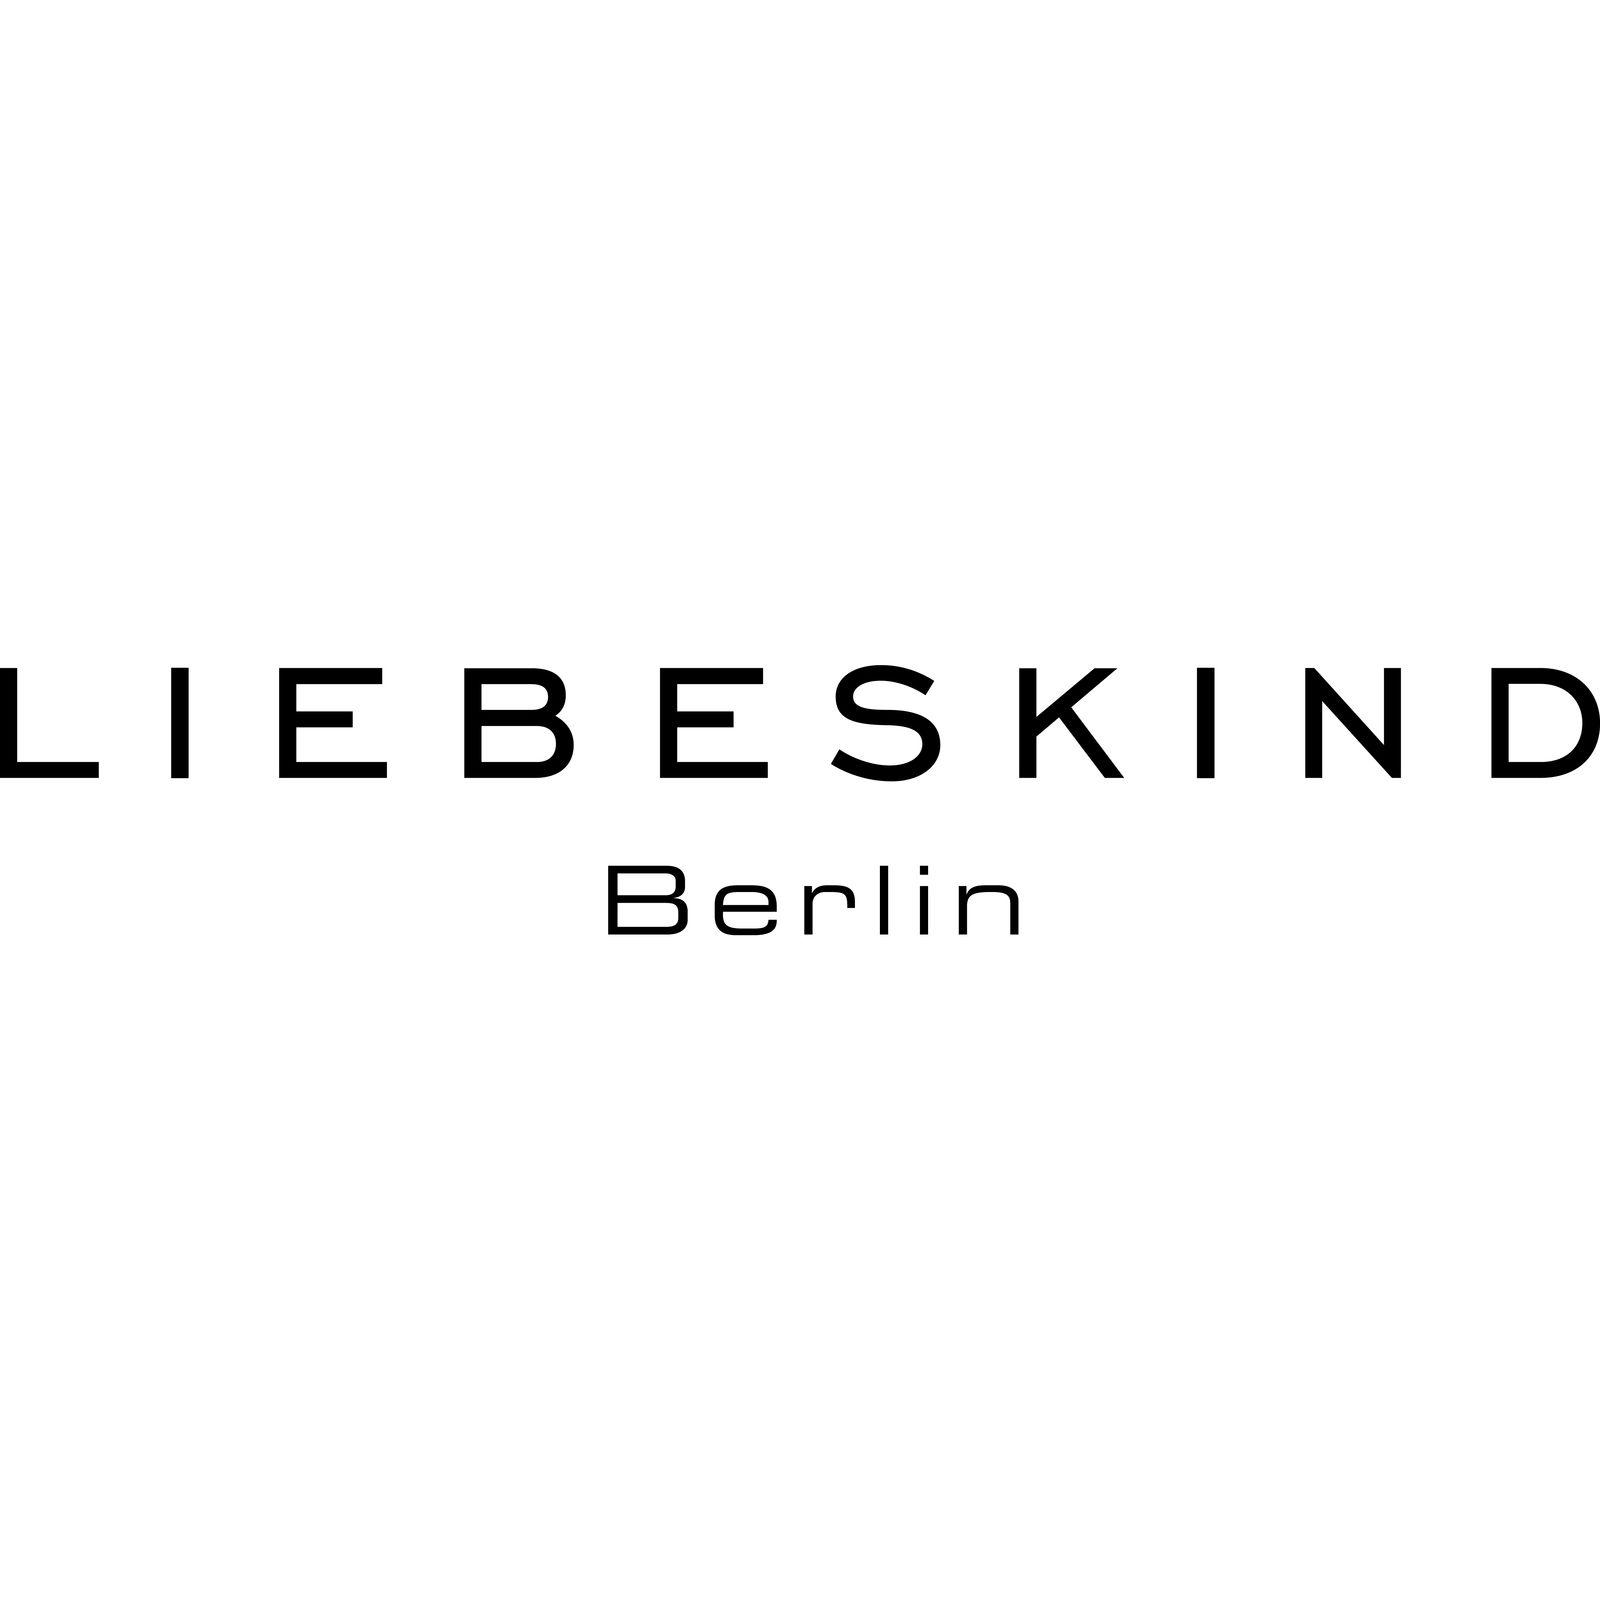 LIEBESKIND Berlin (Image 1)